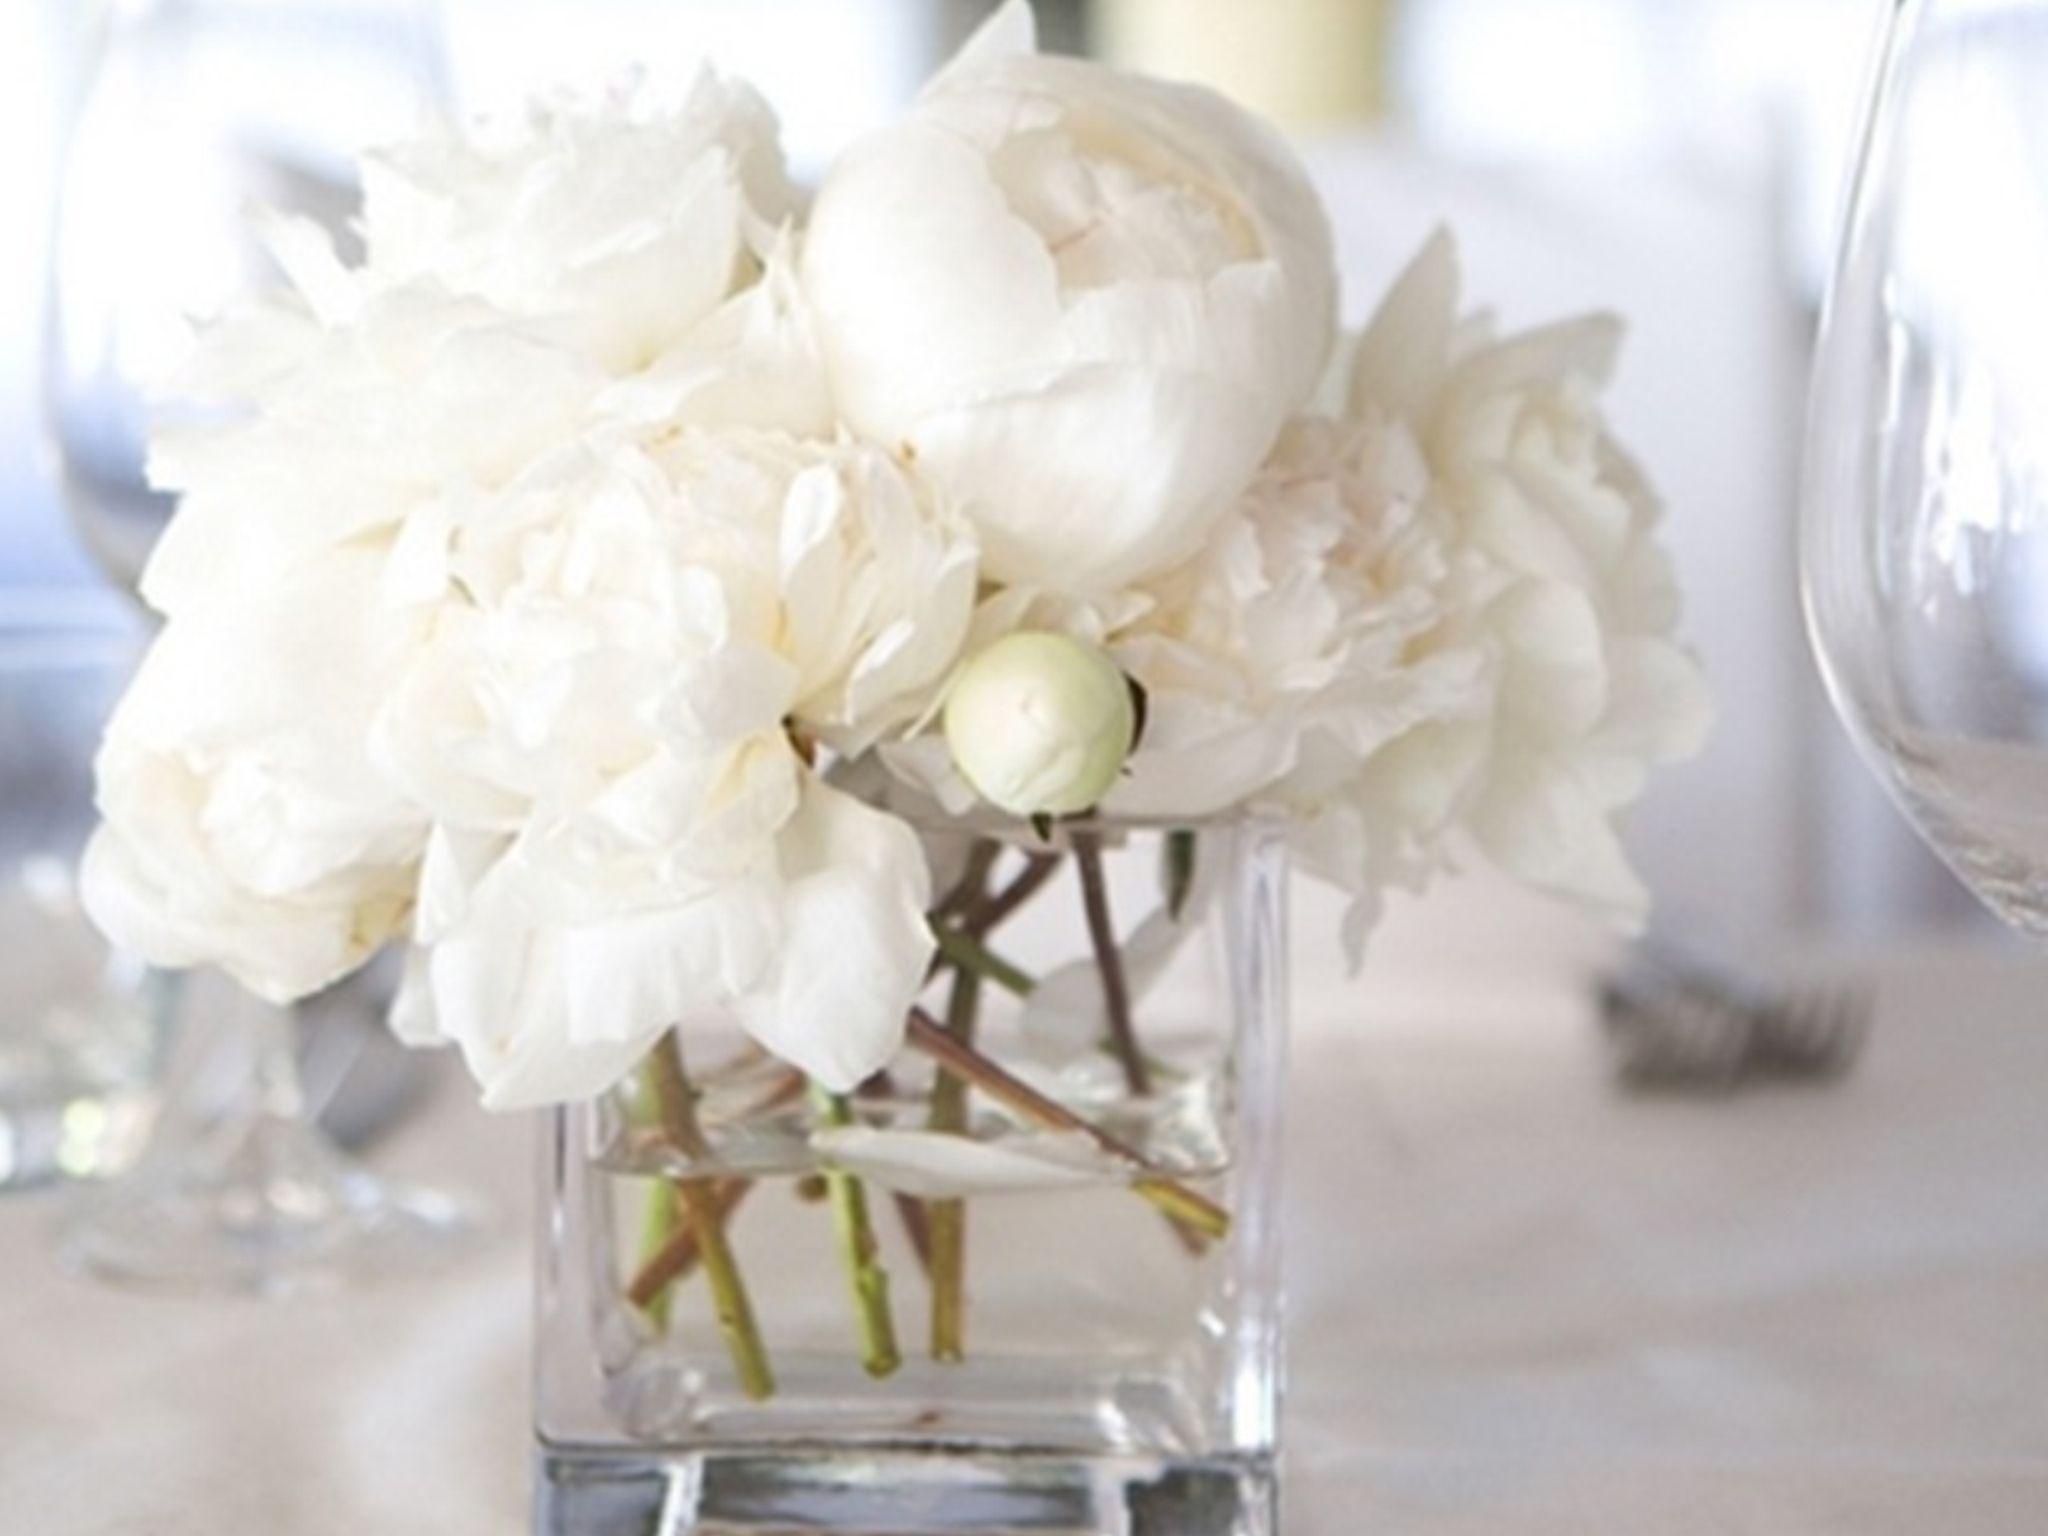 Centerpiece | My wedding | Pinterest | Centerpieces and Weddings